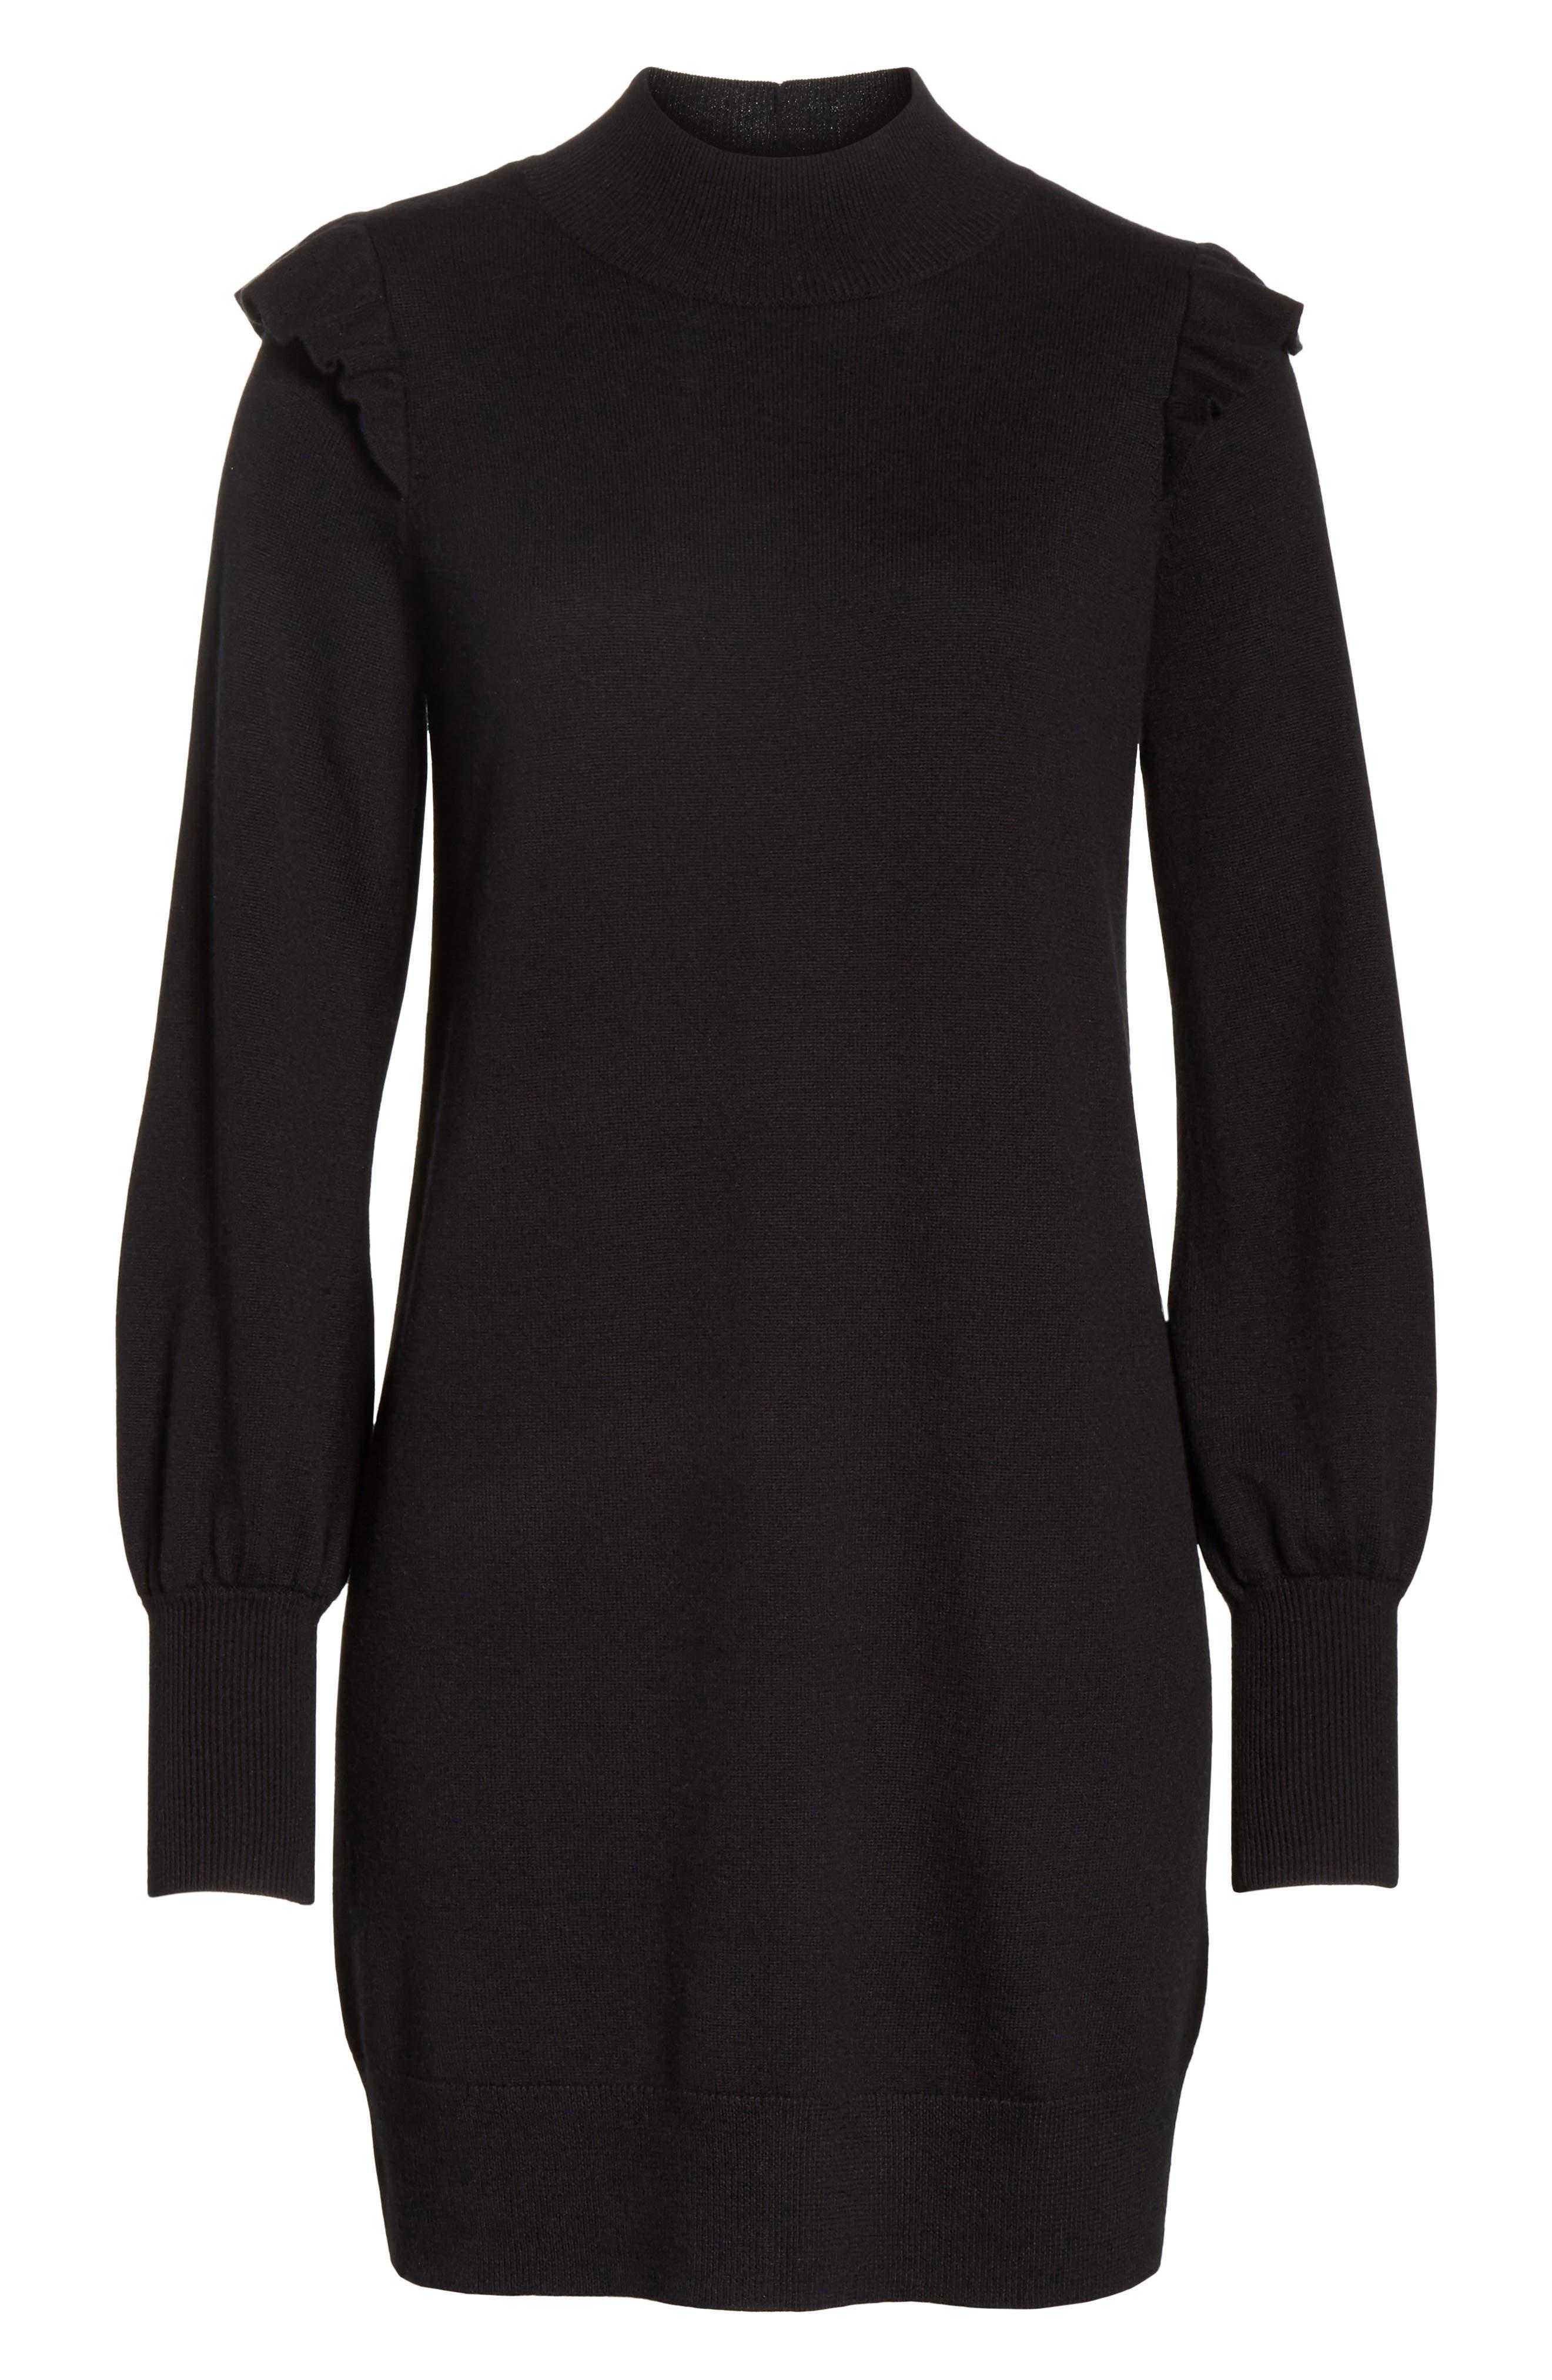 Catriona Wool & Silk Sweater Dress,                             Alternate thumbnail 6, color,                             002